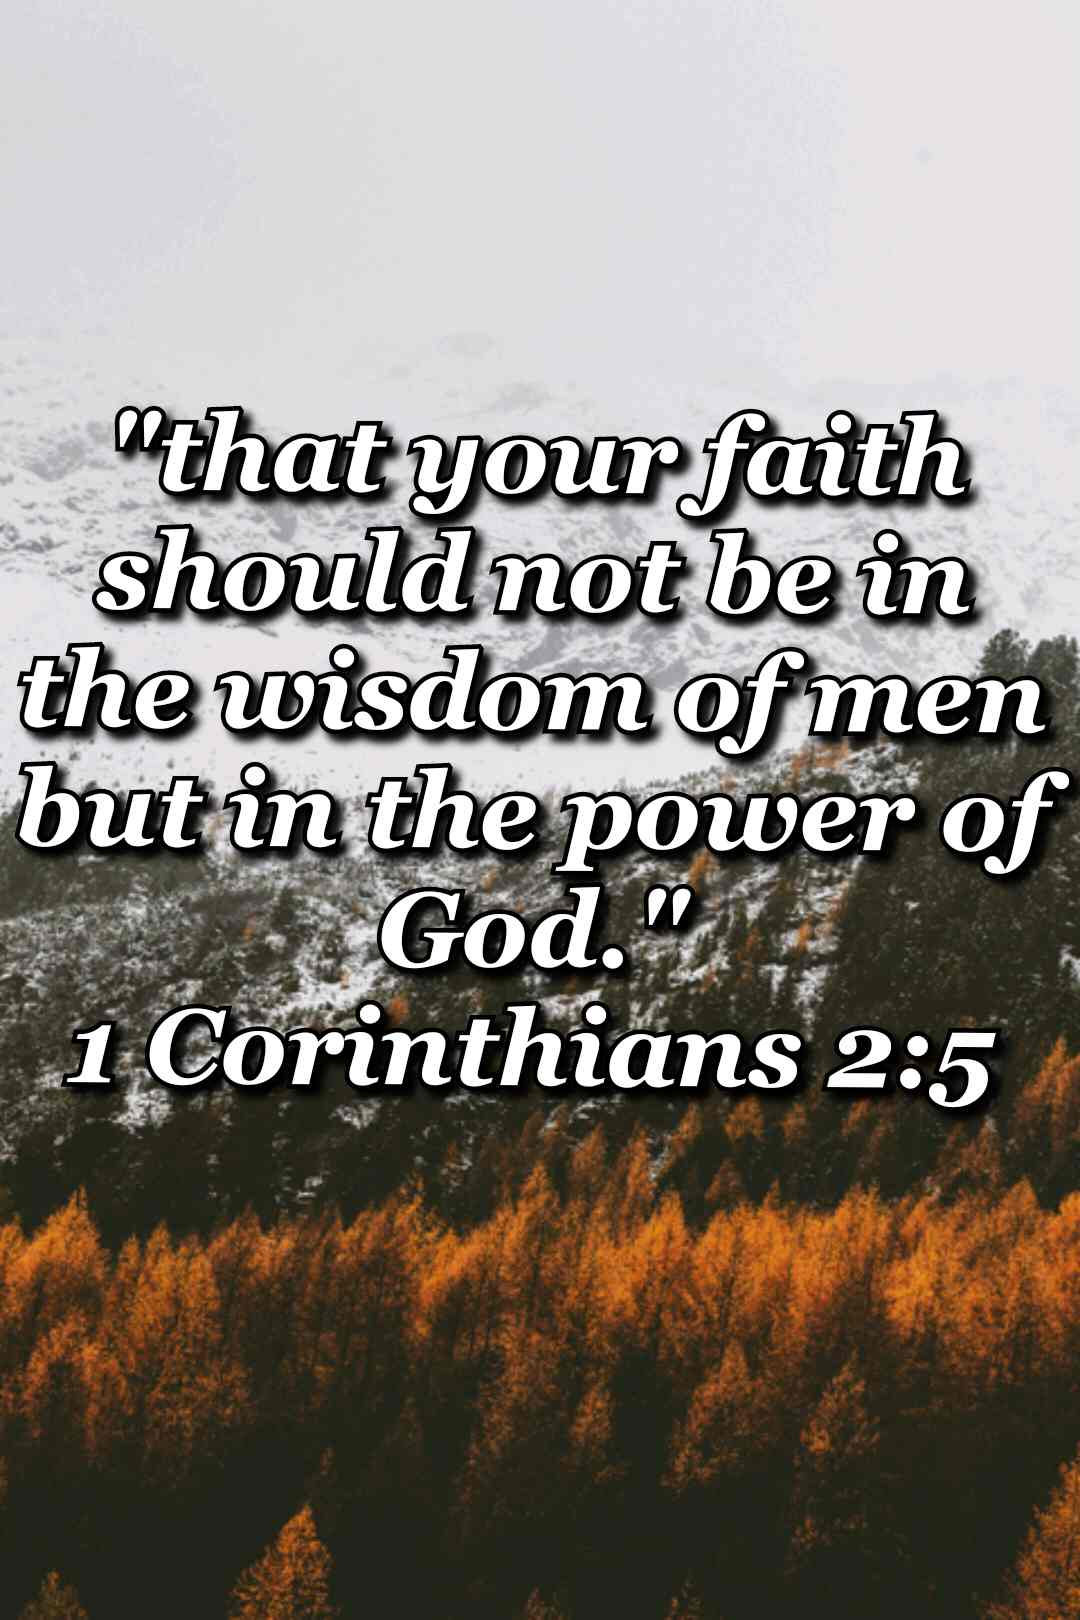 bible varses wallpaper faith (1 Corinthians 2:5)